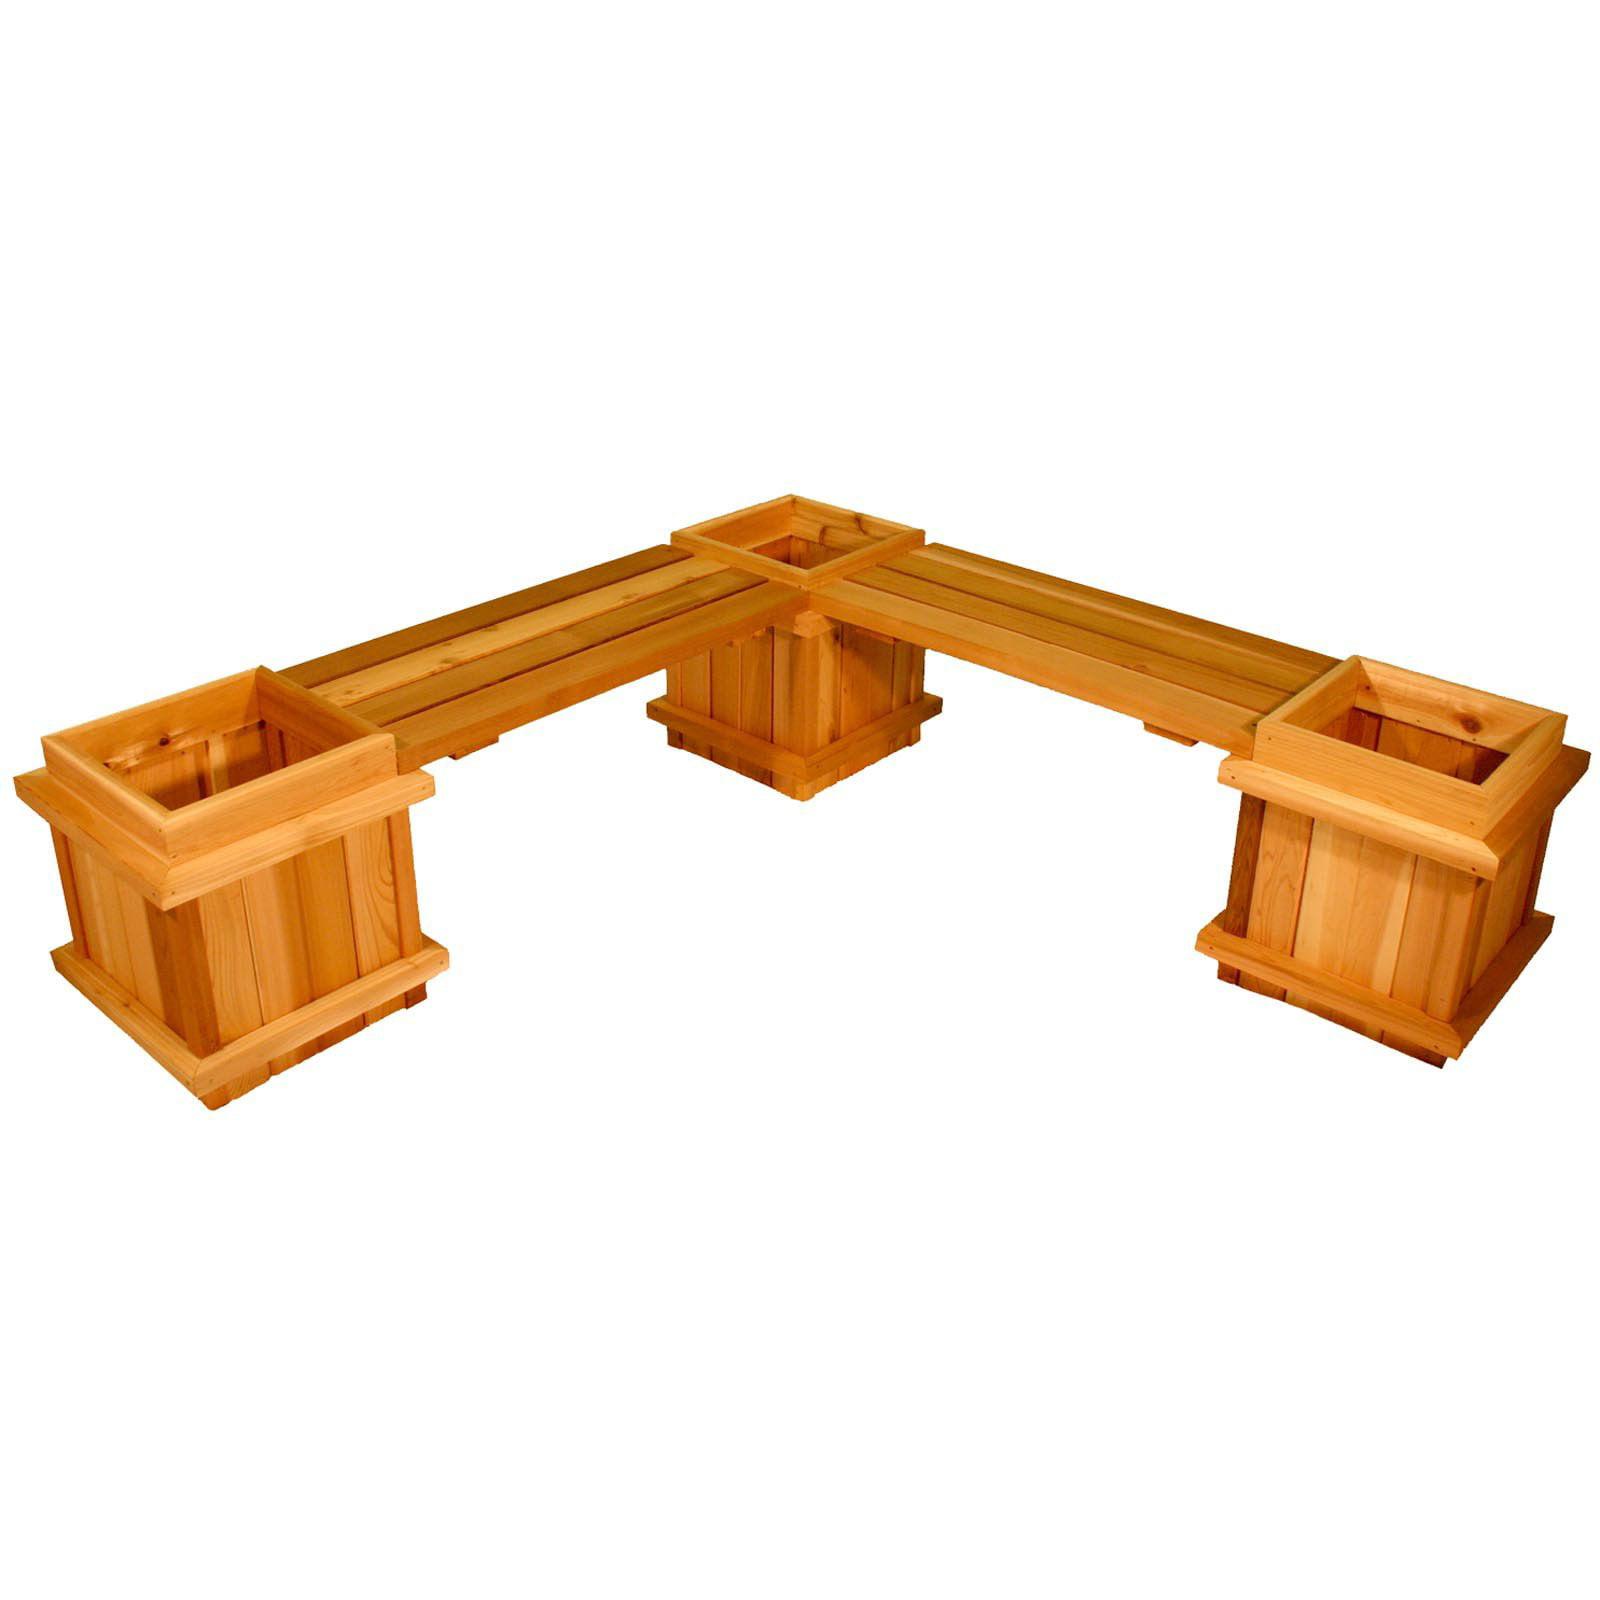 Square Cedar Wood 5-Piece Planter Bench Set by Aquila Cedar Products Ltd